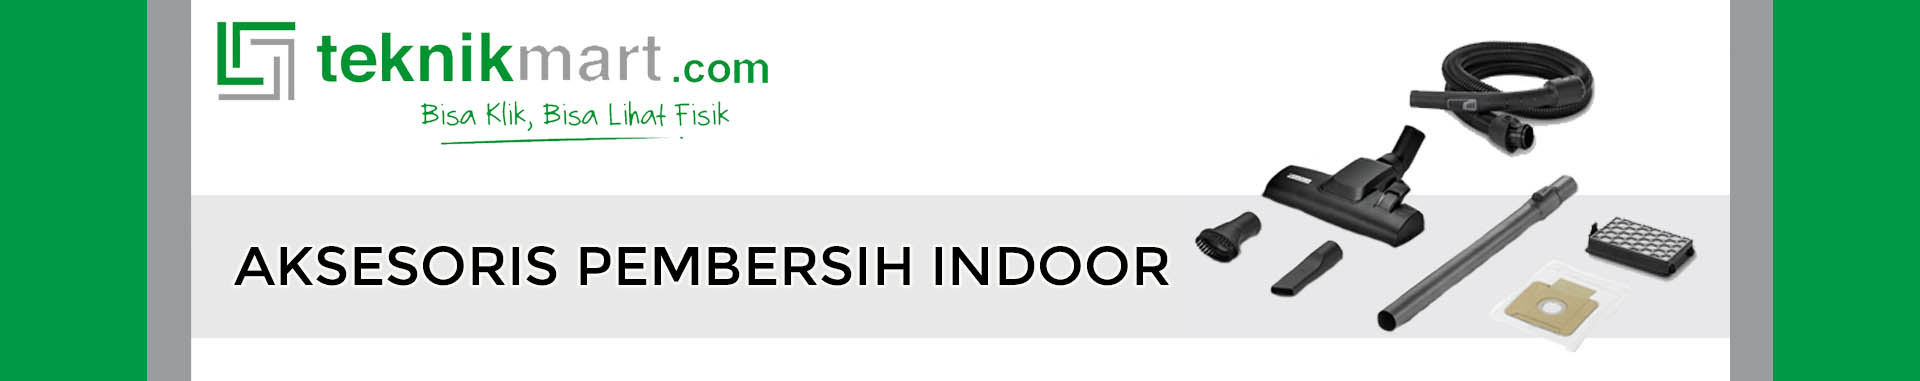 Aksesoris Pembersih Indoor